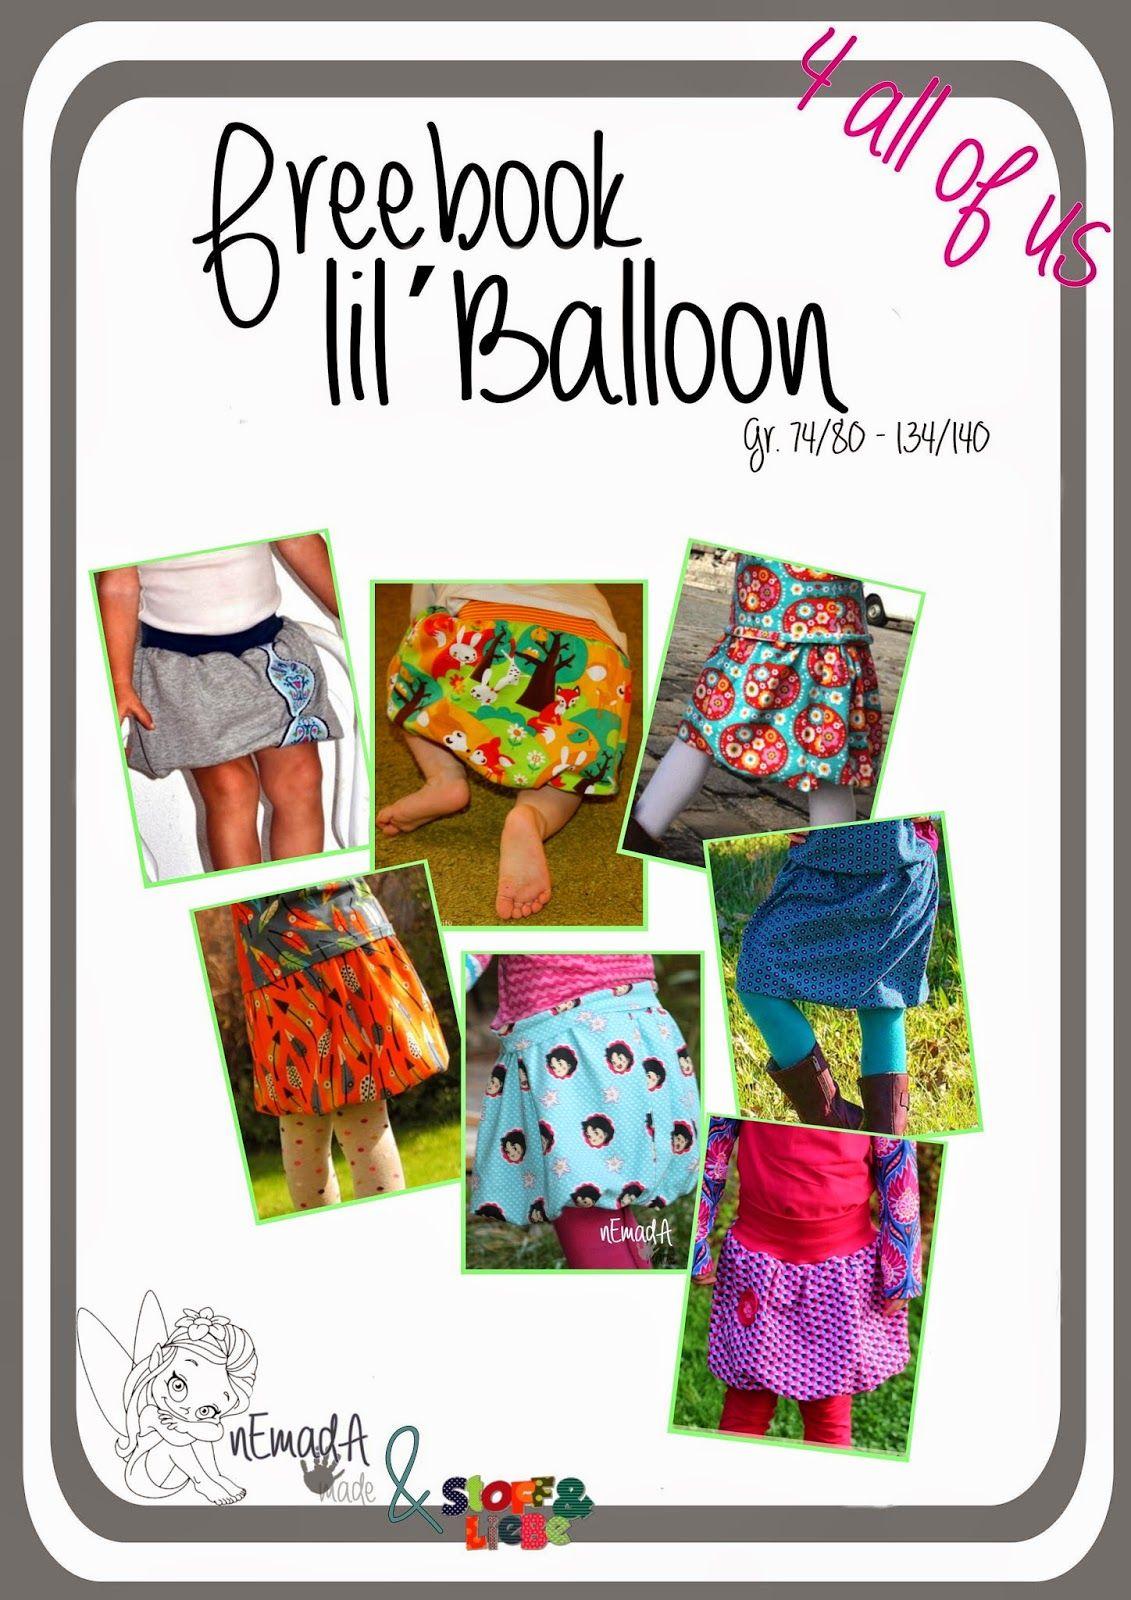 Freebook nEmadA lil_Balloon - jersey ballon rock - gr. 74/80-134/140 ...